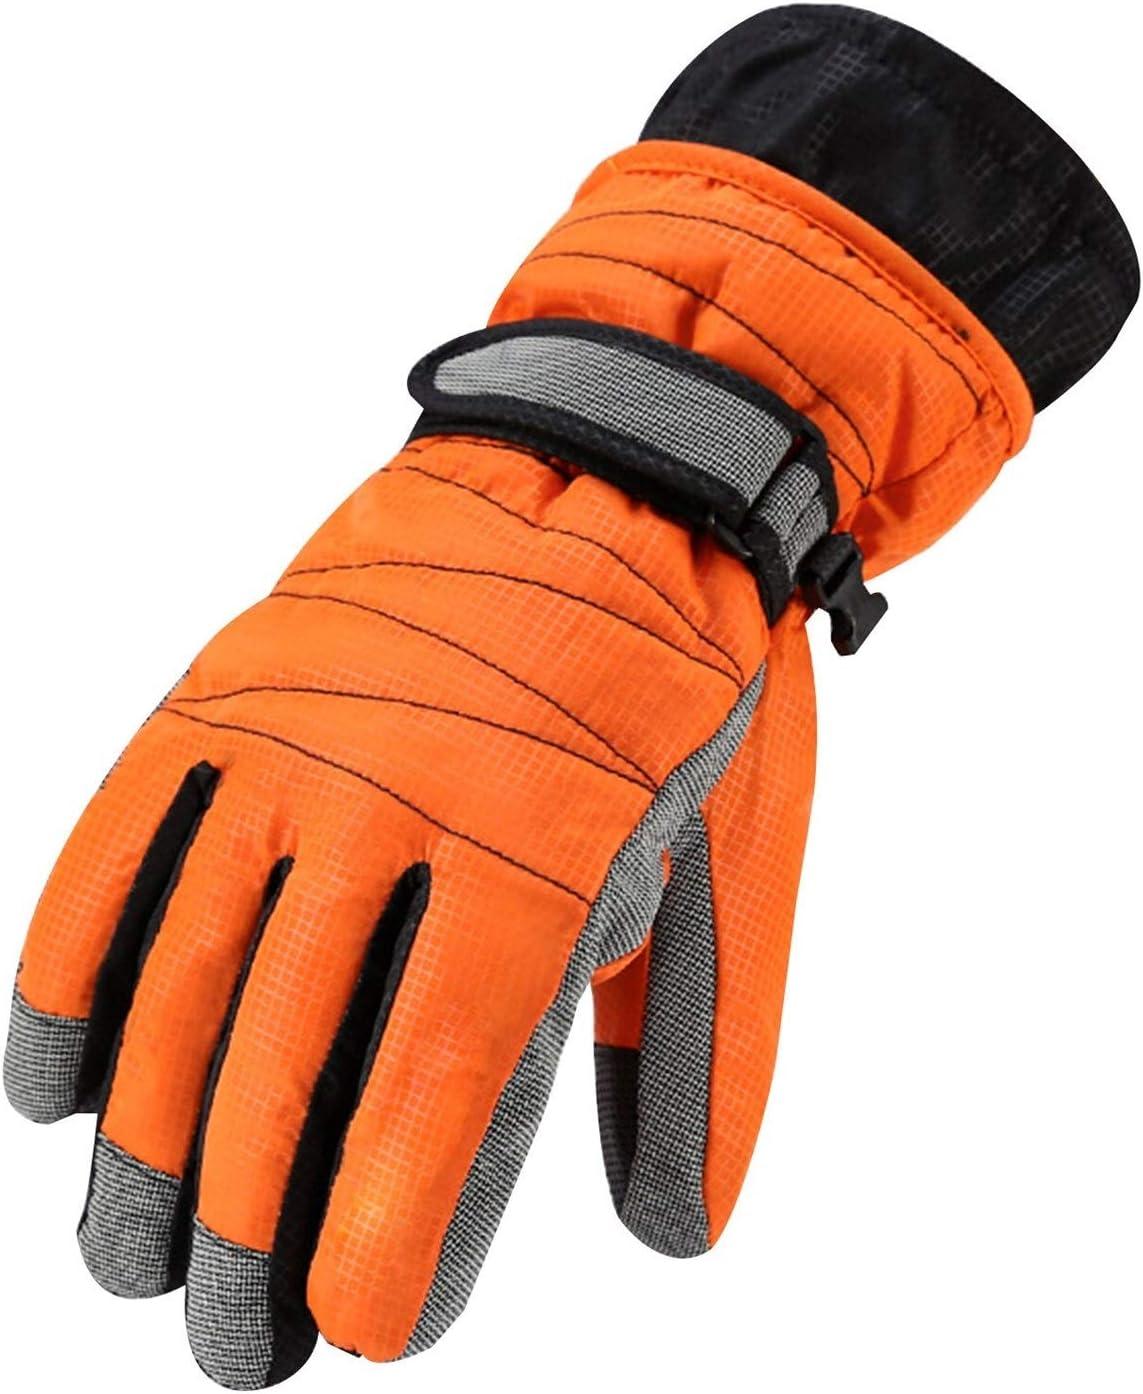 Lupovin-Keep Warm Parent-Child Winter Ski Gloves Raincoat and Ardent Quick-Drying Gloves Non-Slip (Color : Orange, Gloves Size : M)